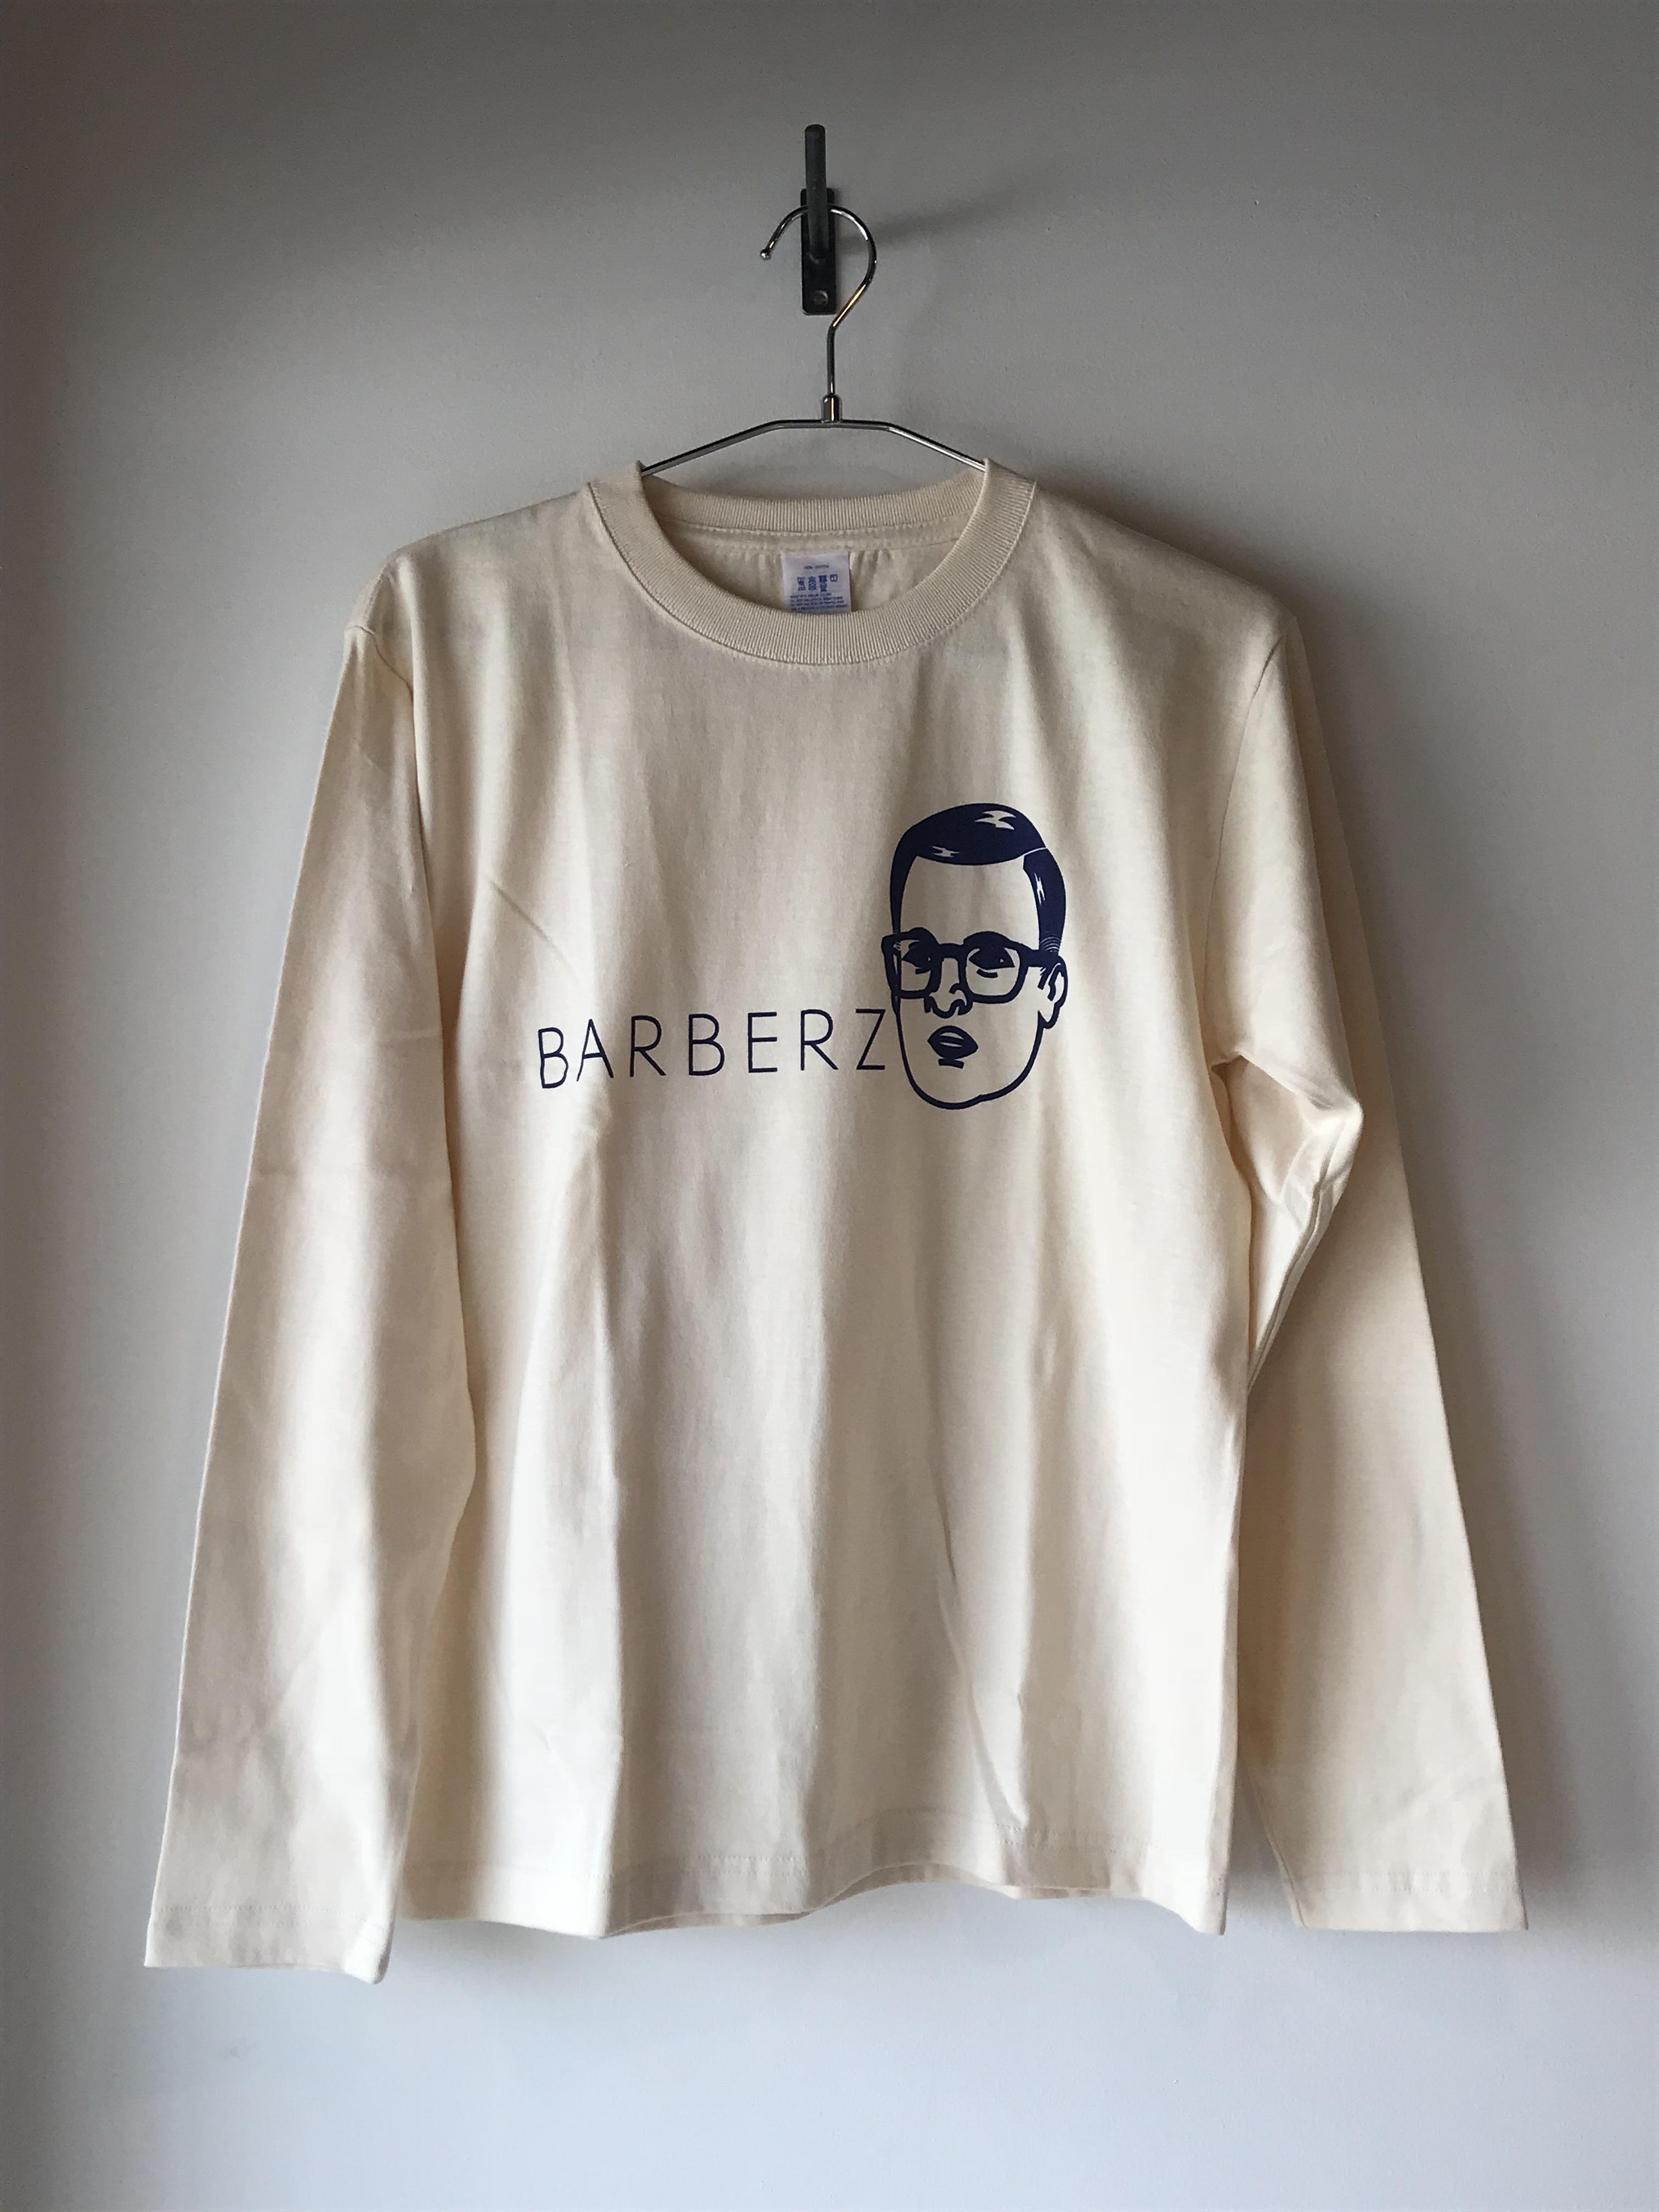 BARBERZ 刈り上げおじさん長袖テイシャツ  ナチュラル